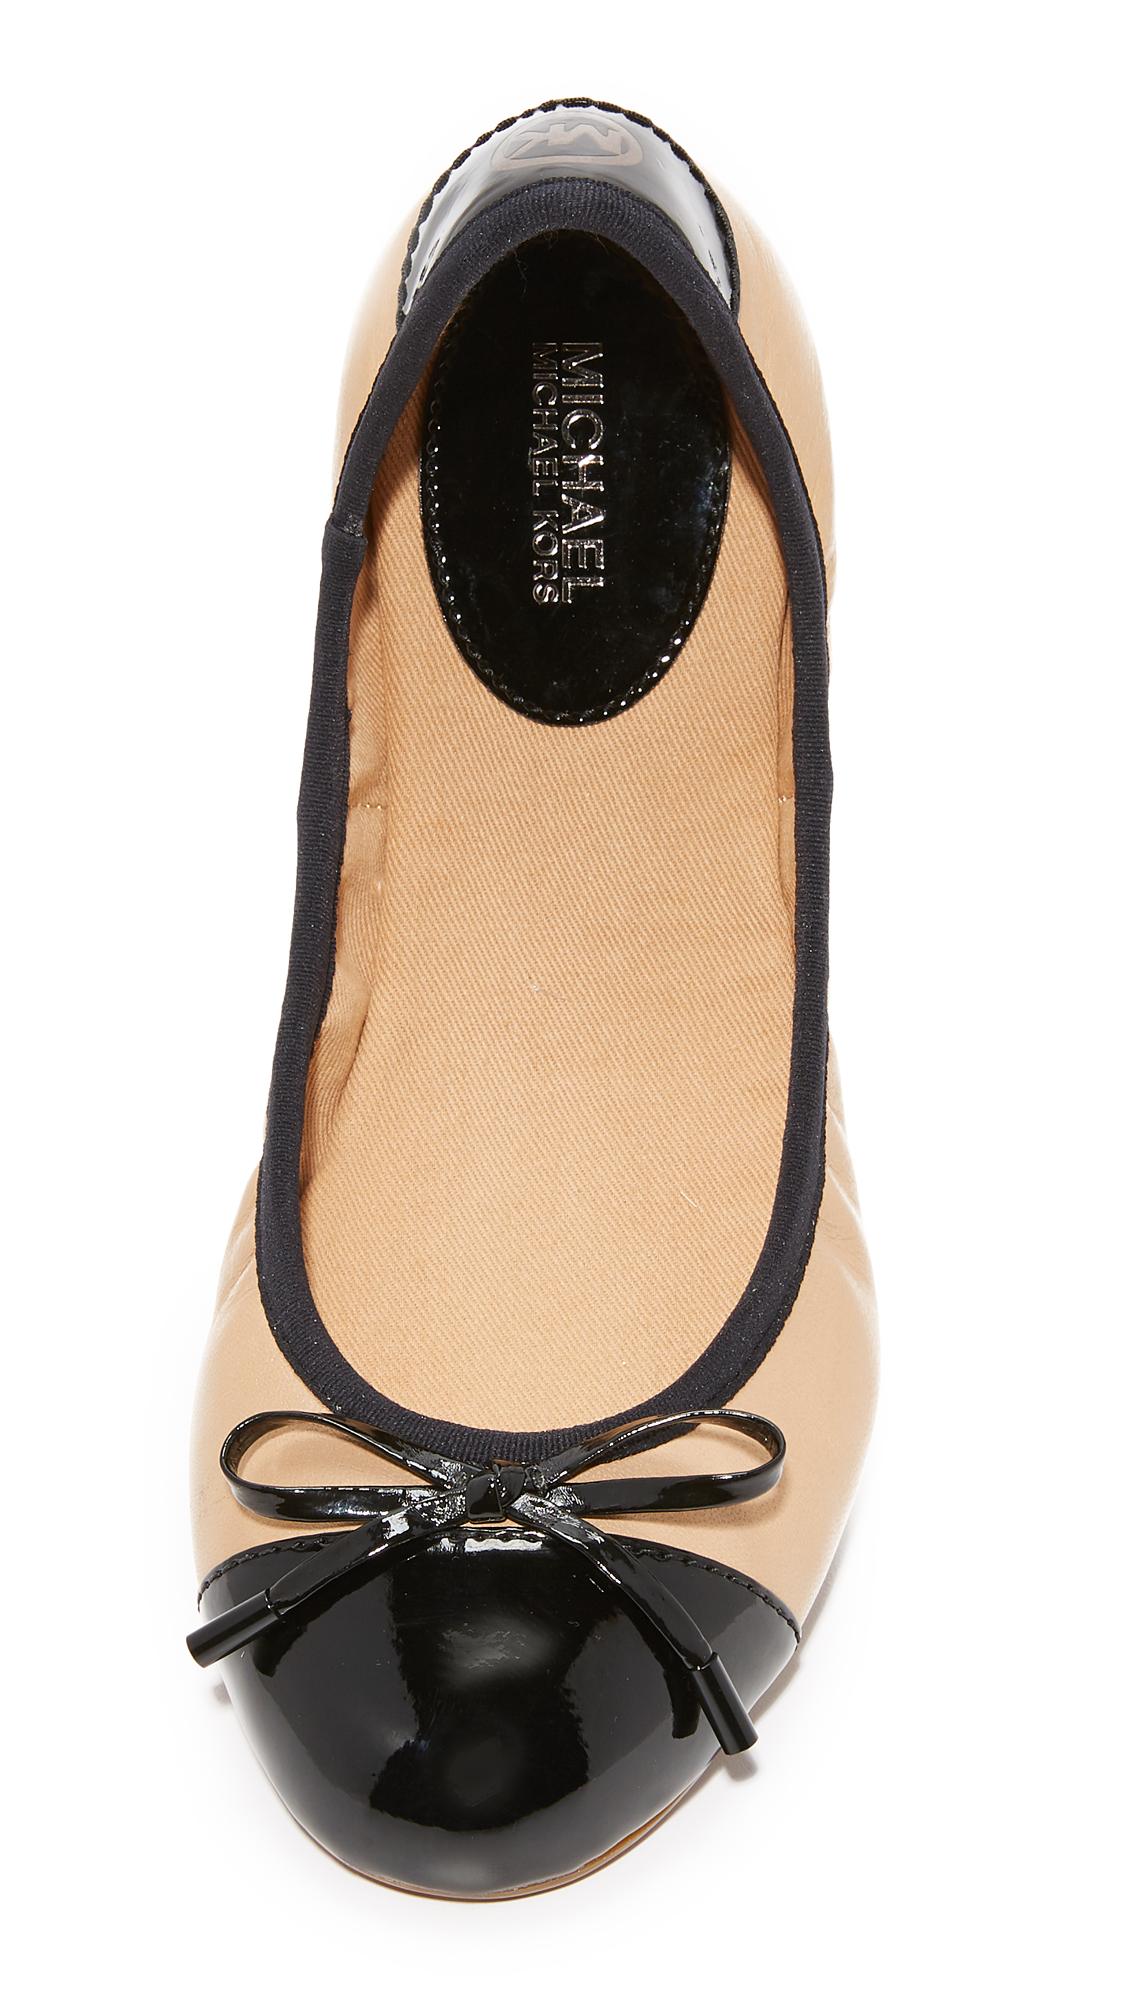 054c6e95eedb MICHAEL Michael Kors MK City Ballet Flats